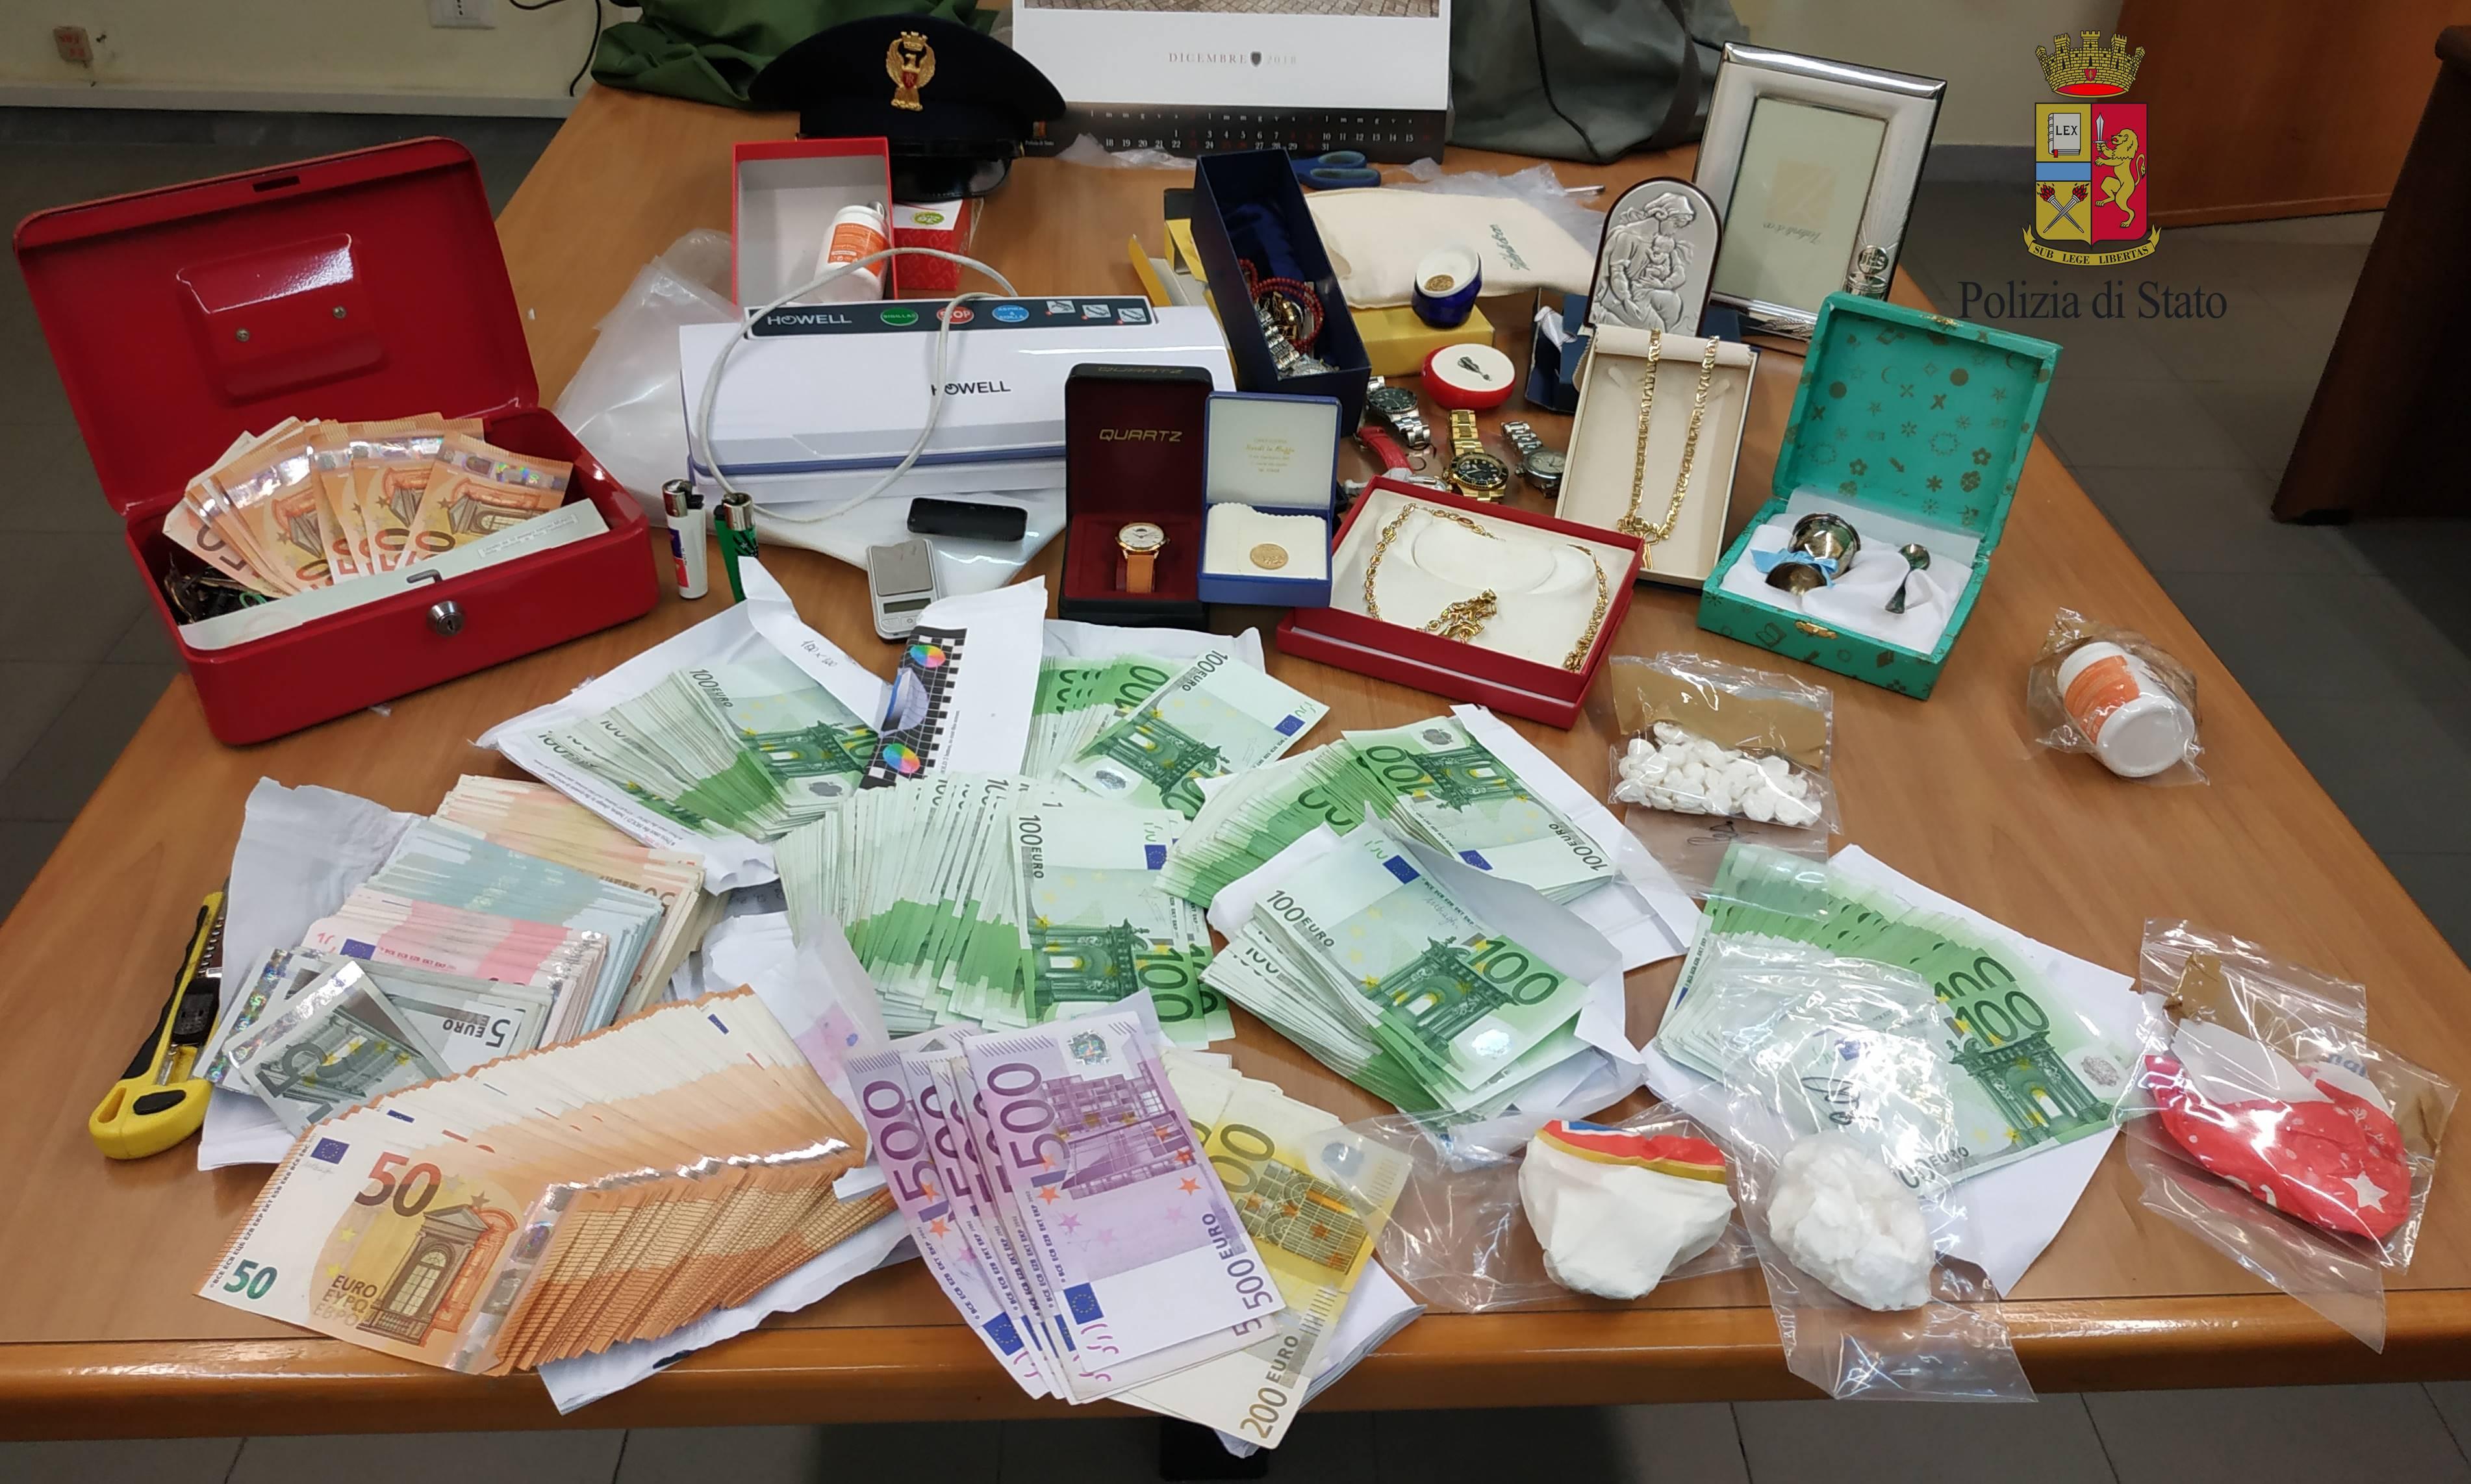 Cocaina, hashish e mariuana, arrestati due ragazzi di Fondi